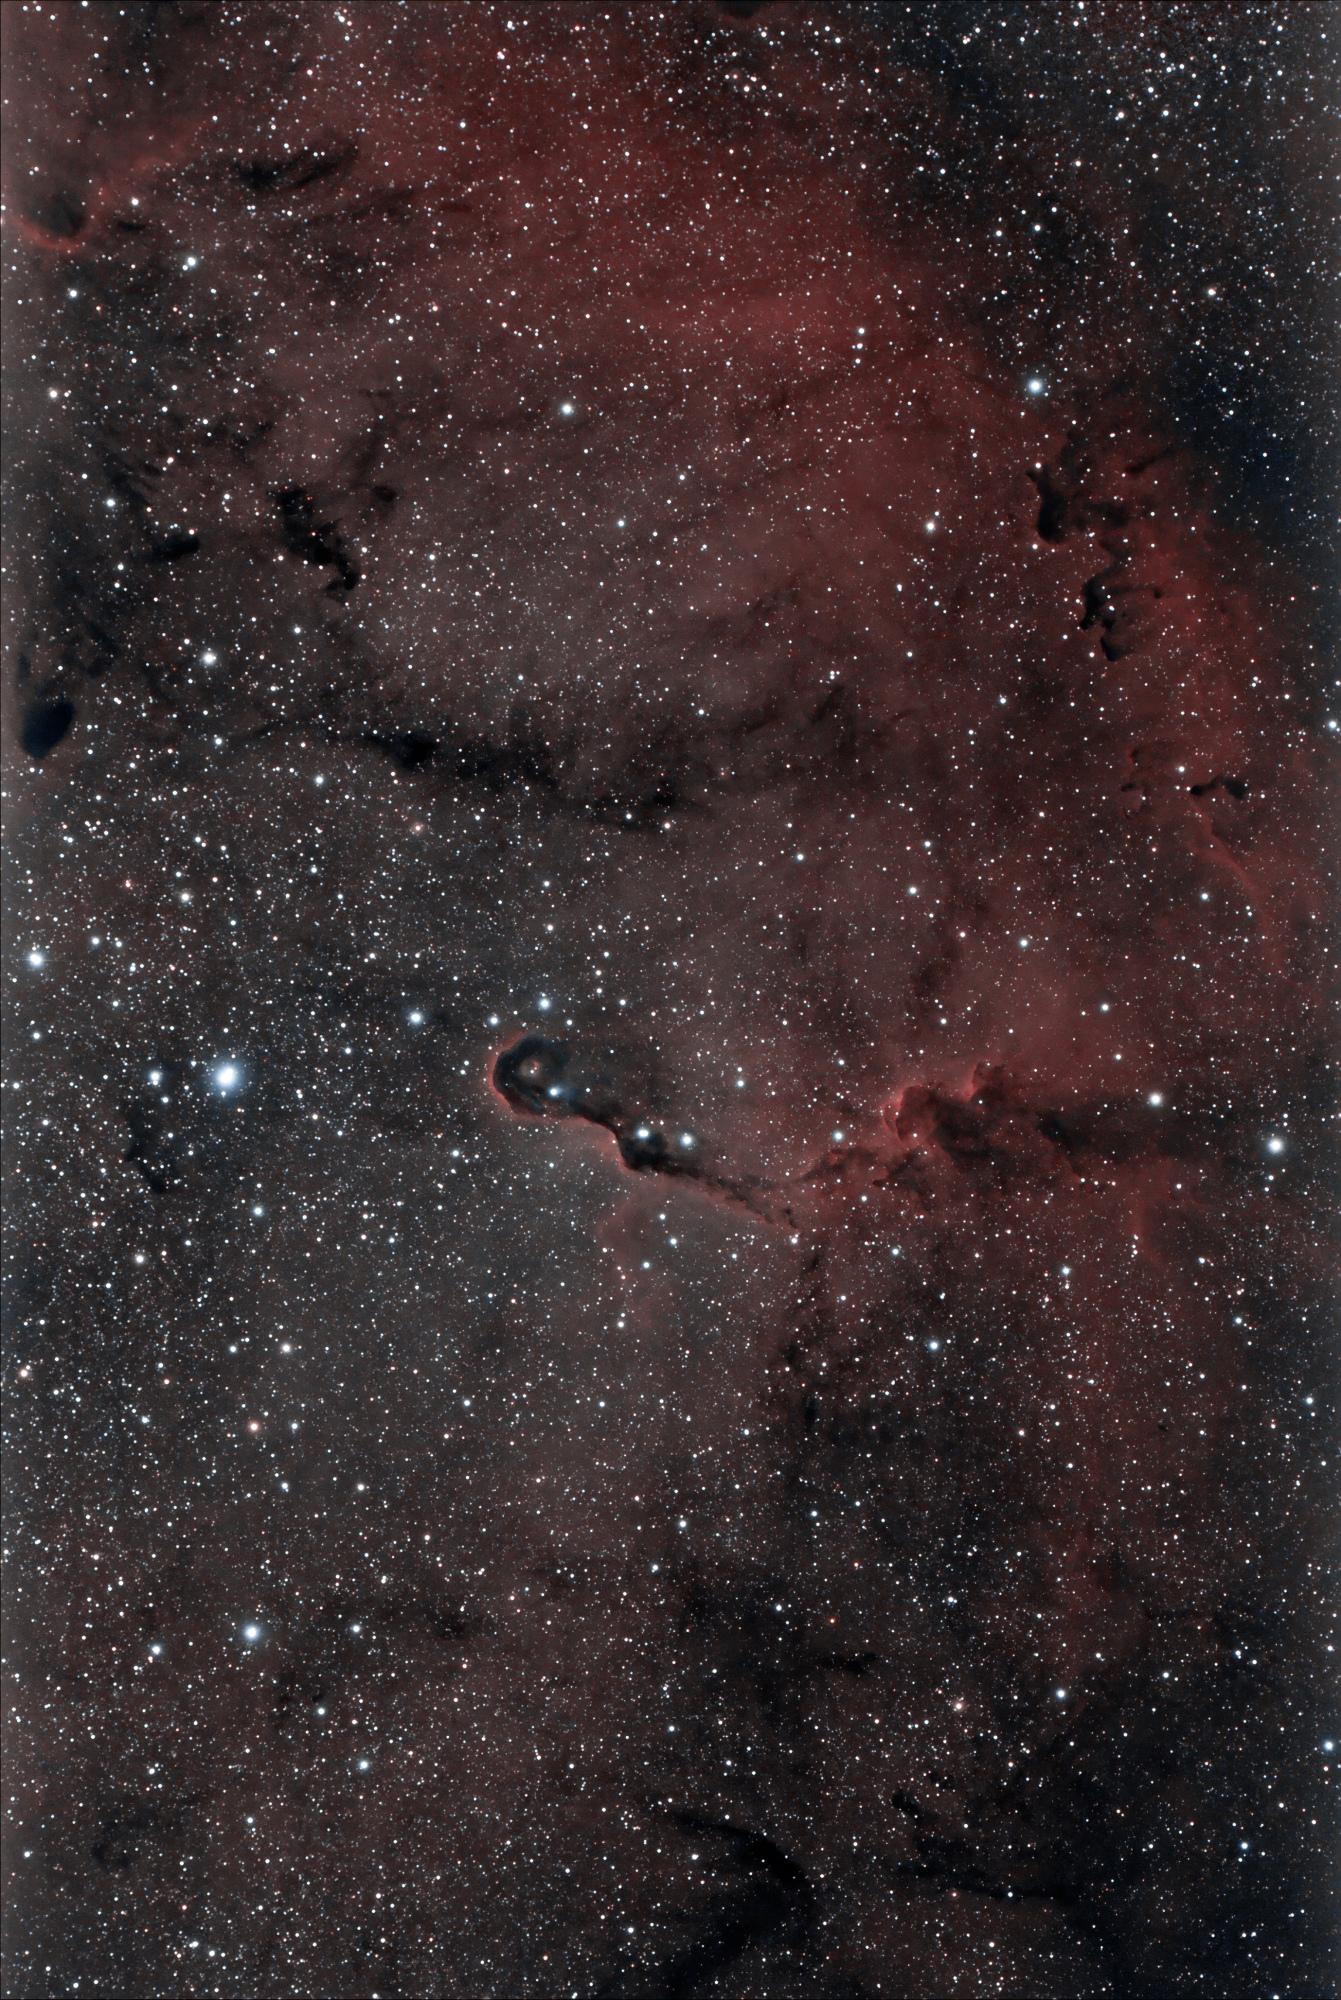 IC-1396_cs6-denoise.thumb.jpeg.60b0fc13793cc57f24bda0b56093ea01.jpeg